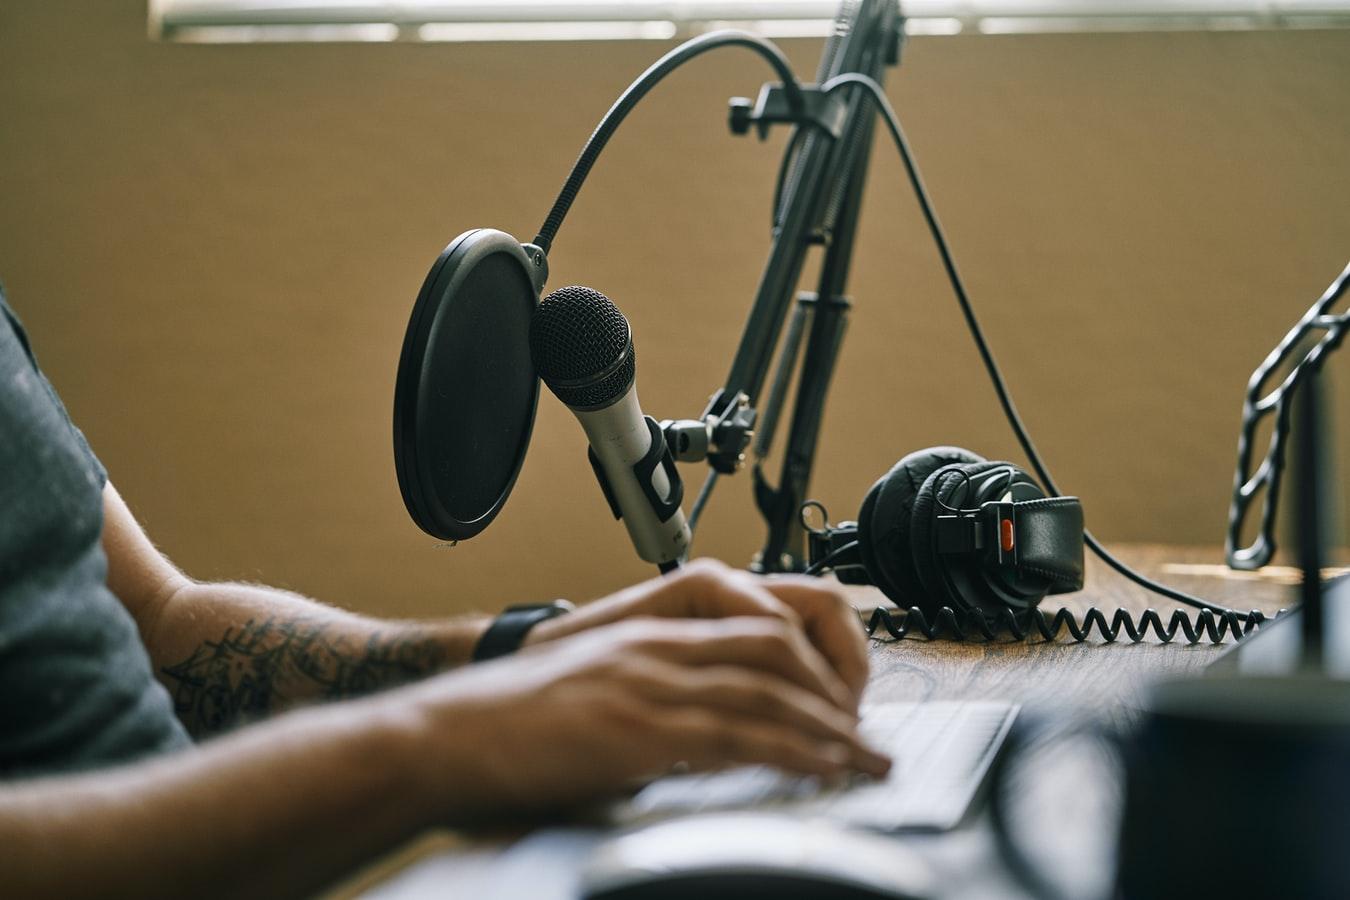 Digital PR: Podcasting in the Era of Round the Clock Covid-19 Coverage